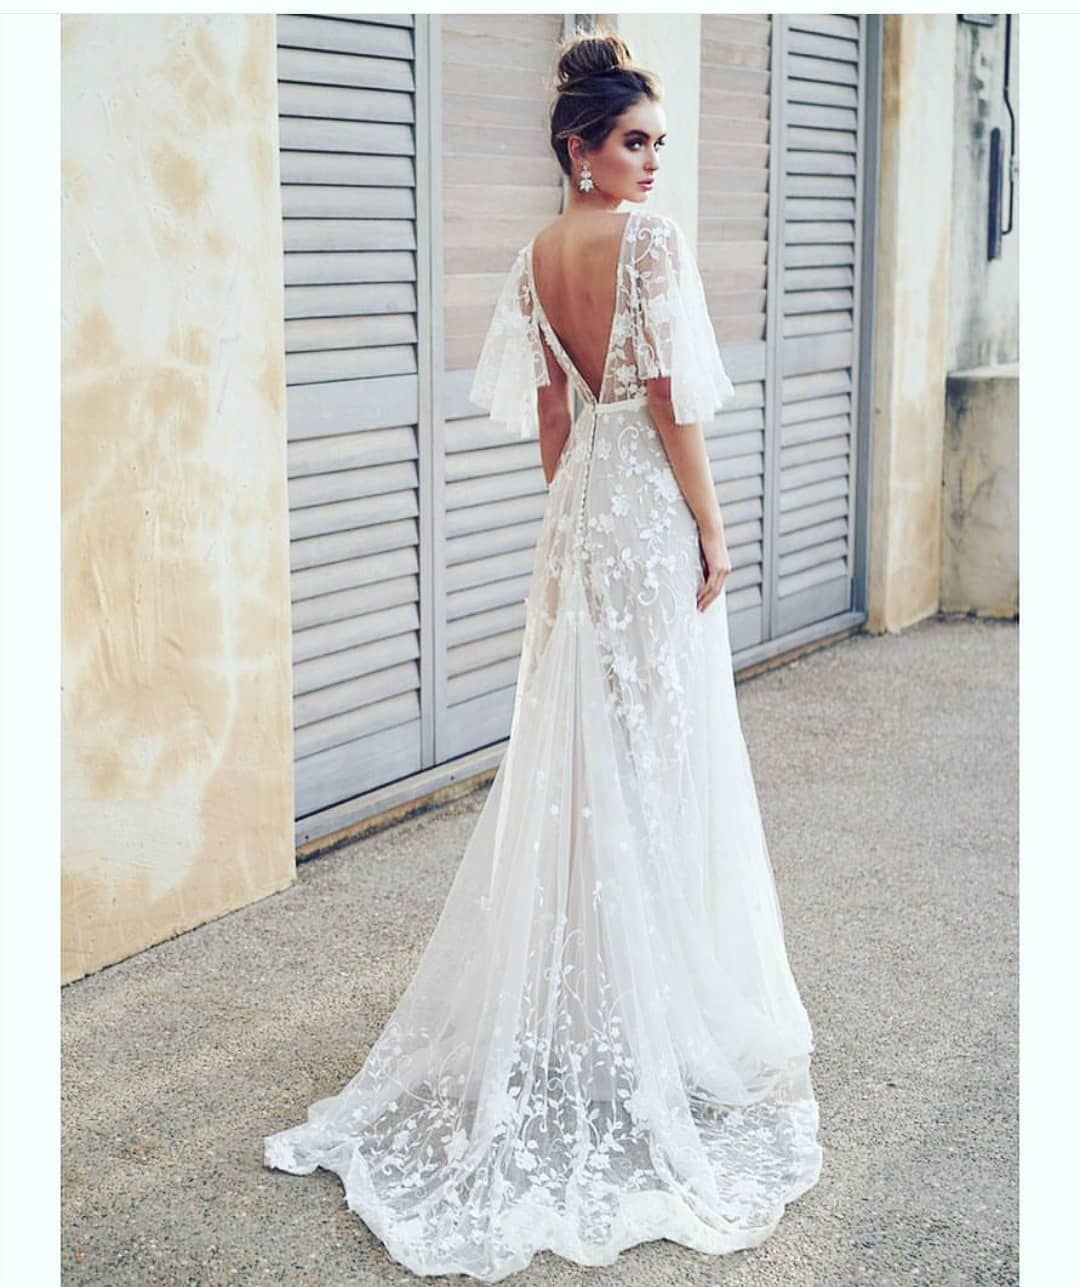 Striking in White @annacampbellbridal #bridalwear #weddings ...